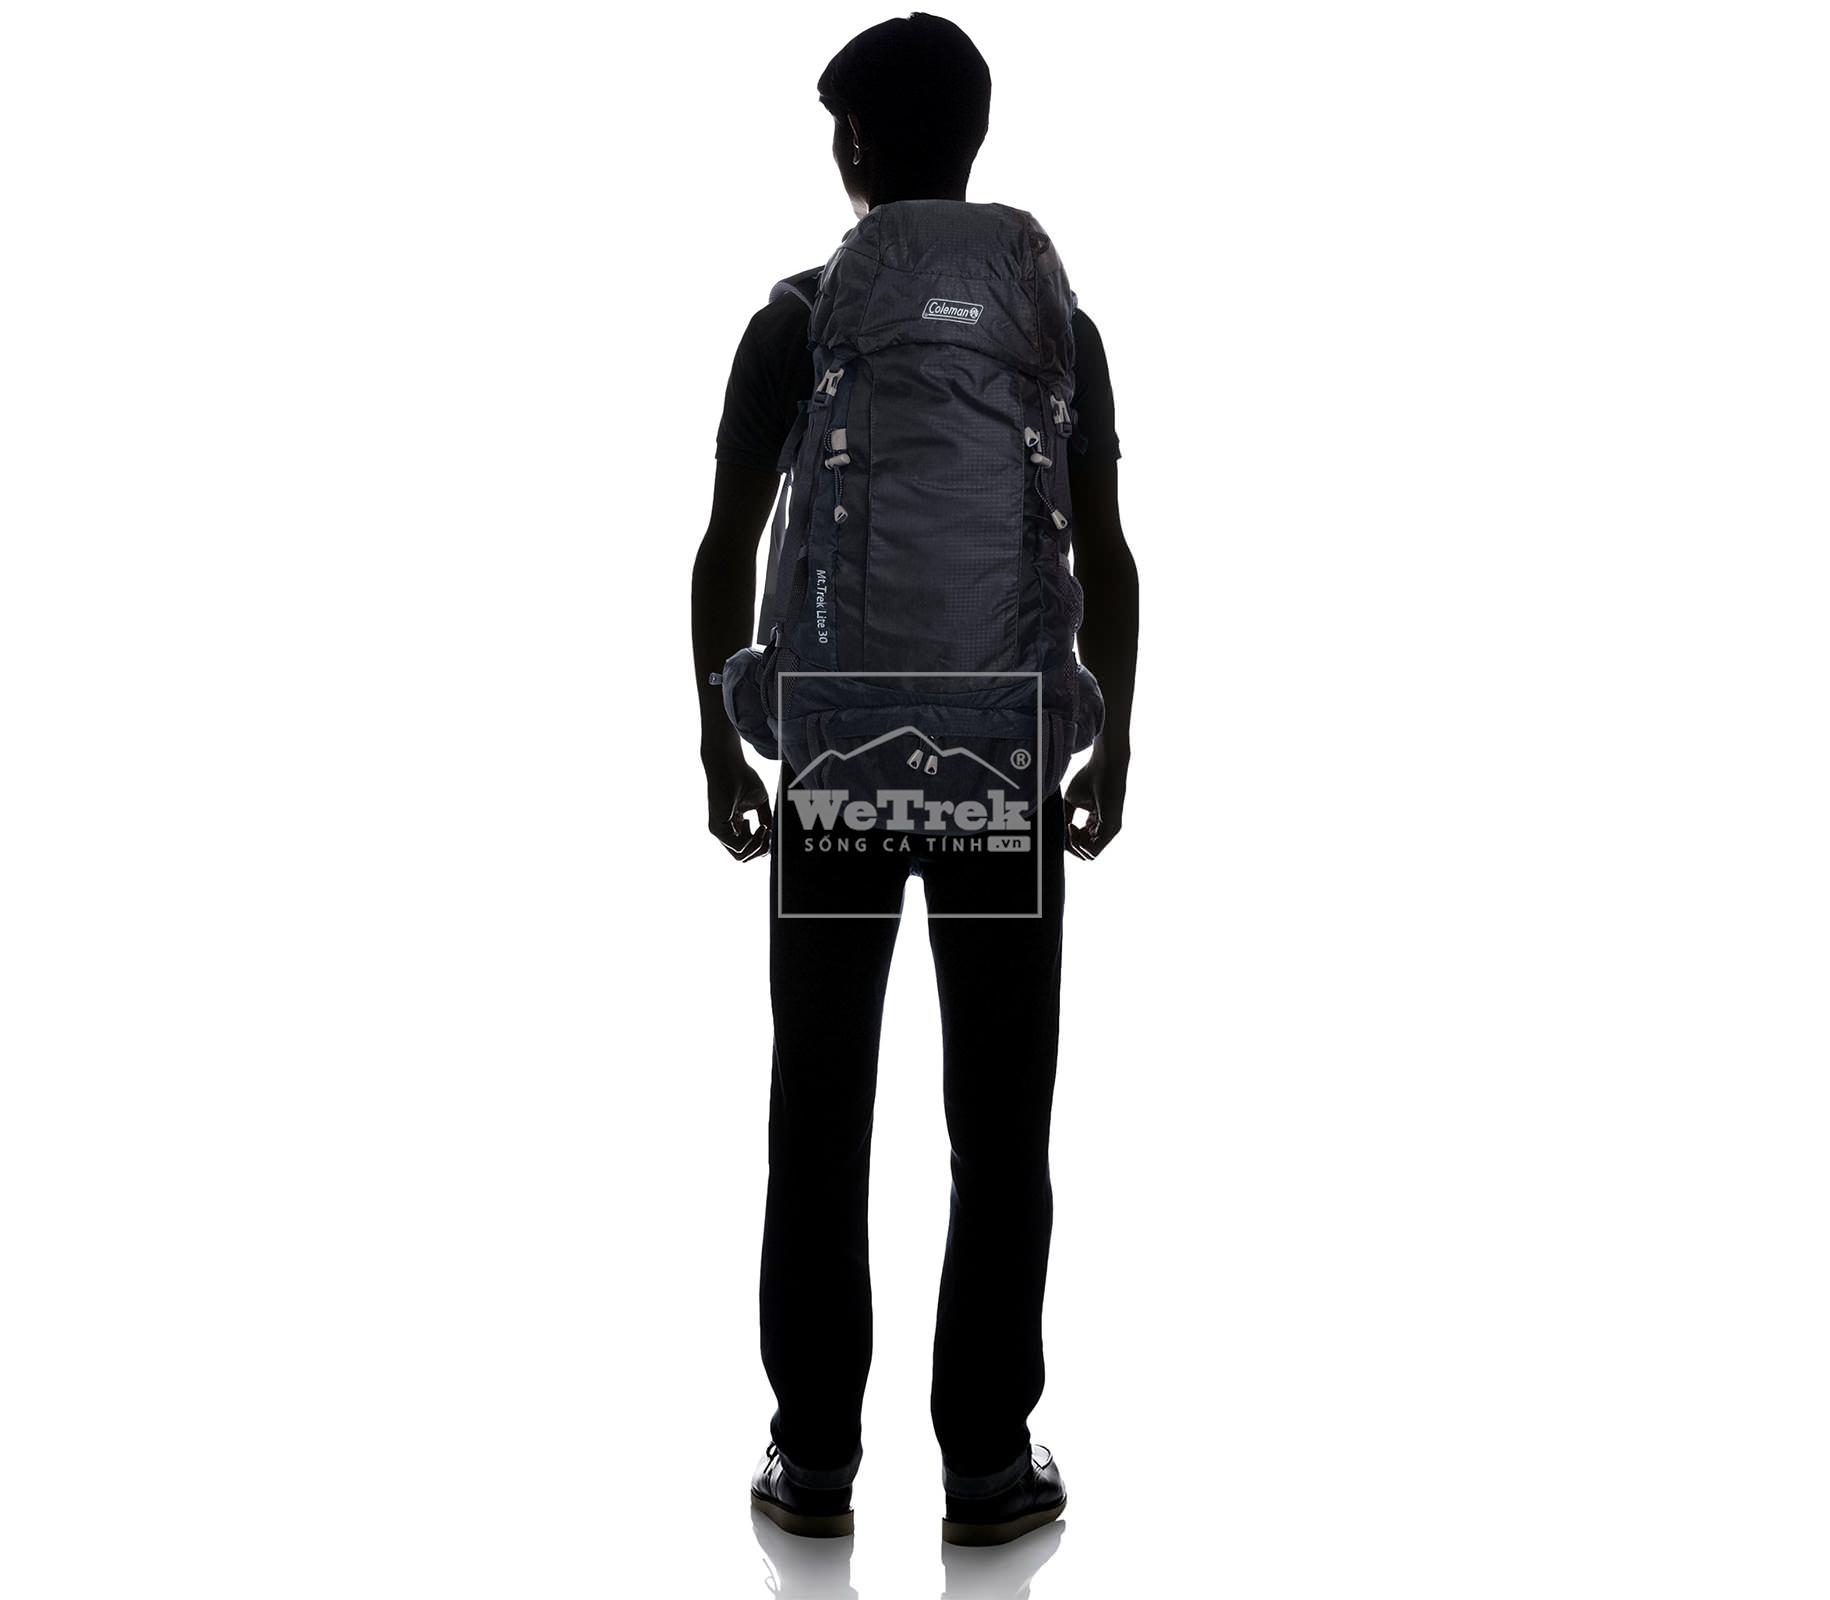 ba-lo-leo-nui-30l-coleman-mttrek-lite-backpack-black-cbb4071bk-7457-wetrek.vn-2